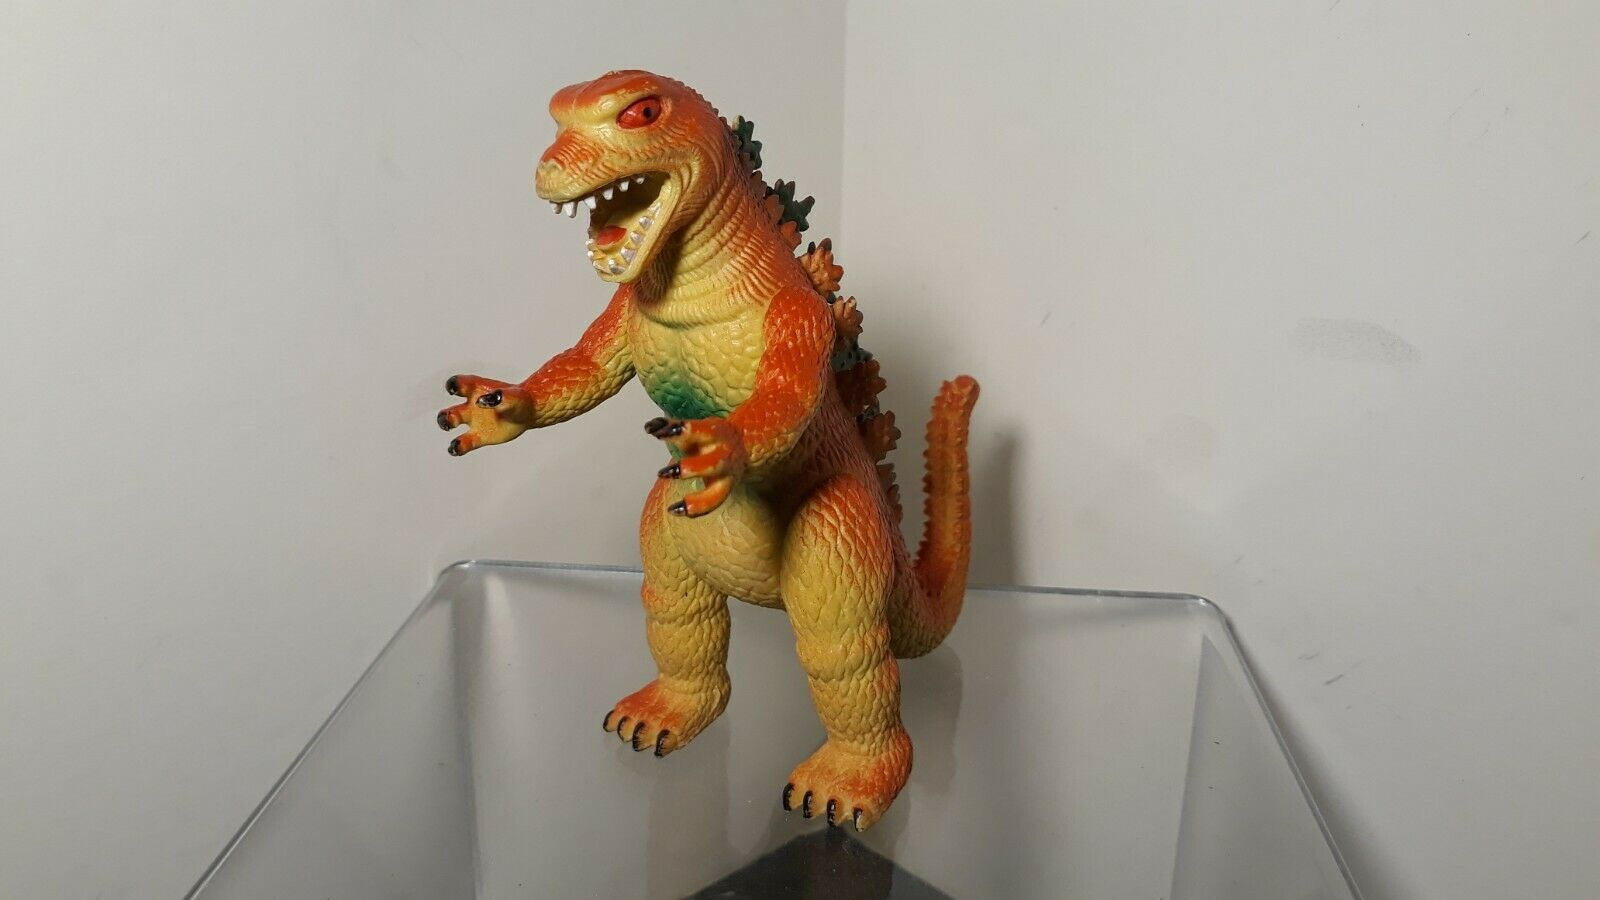 Knock Off Imperial Godzilla KO Bootleg Orange / Yellow / Green